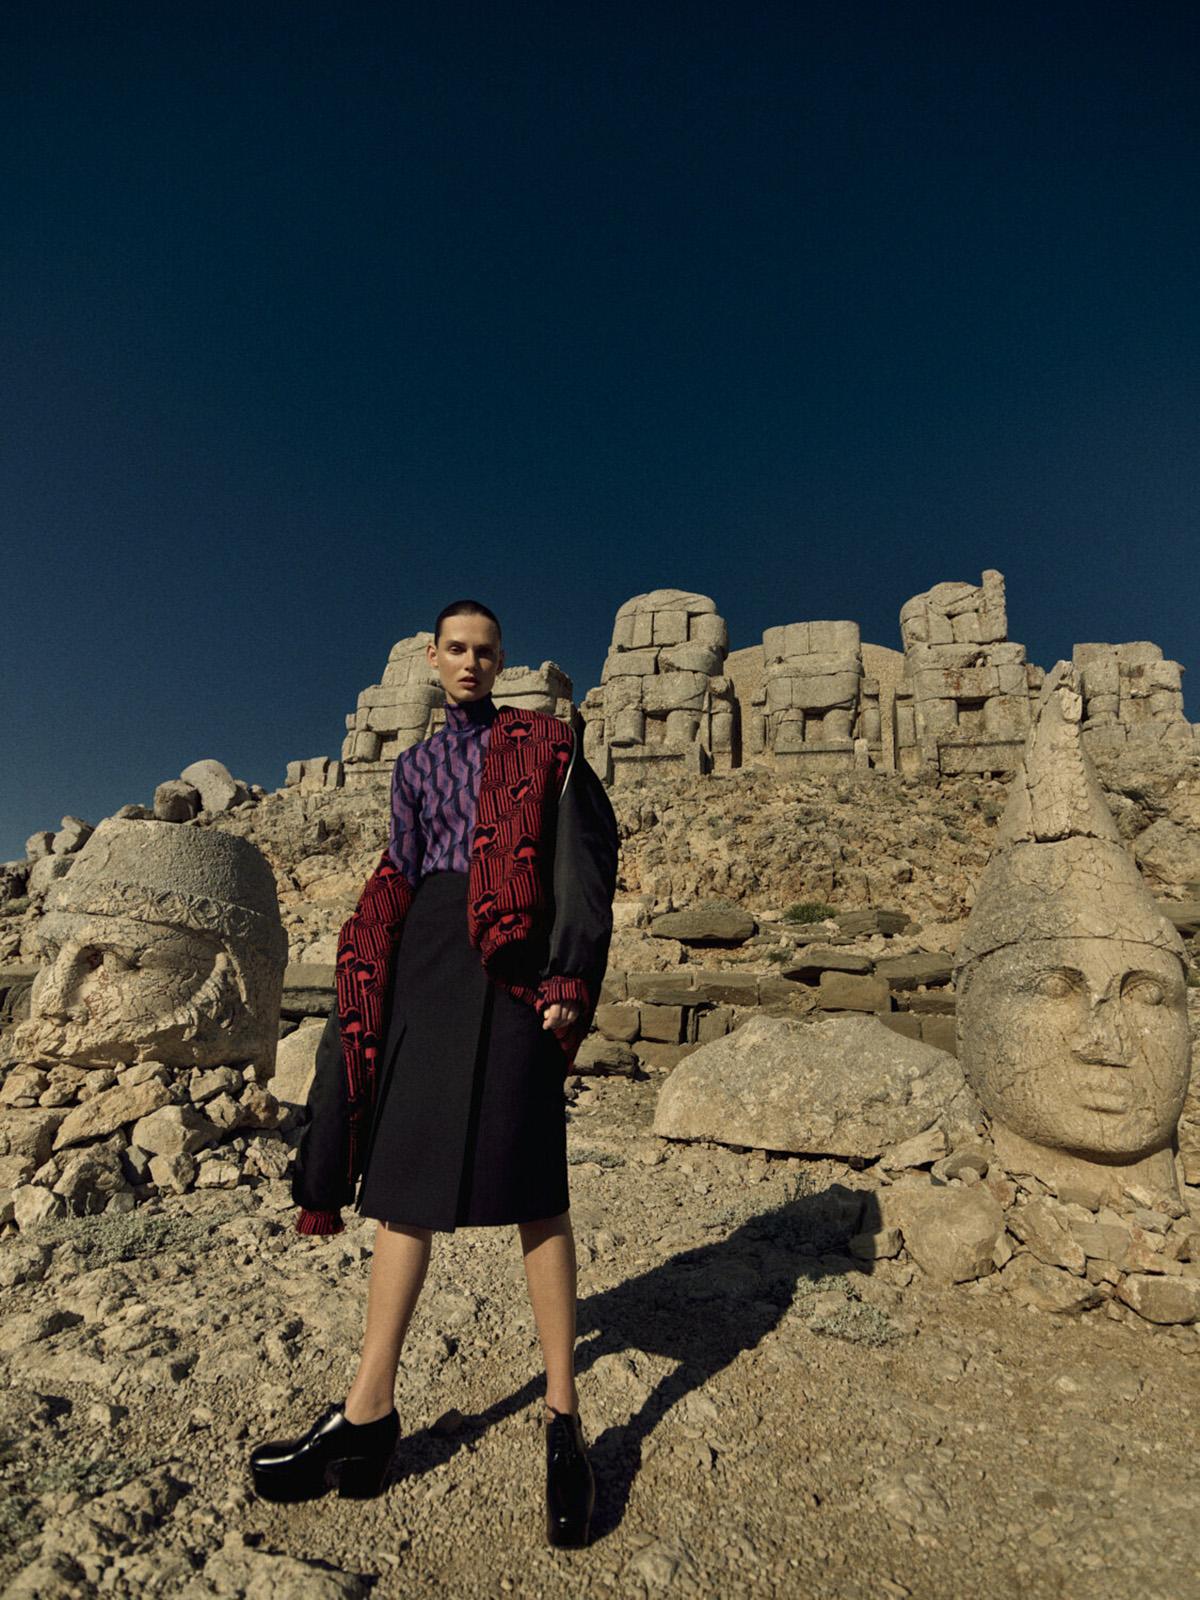 Giedre Dukauskaite covers Vogue Turkey September 2021 by Yulia Gorbachenko